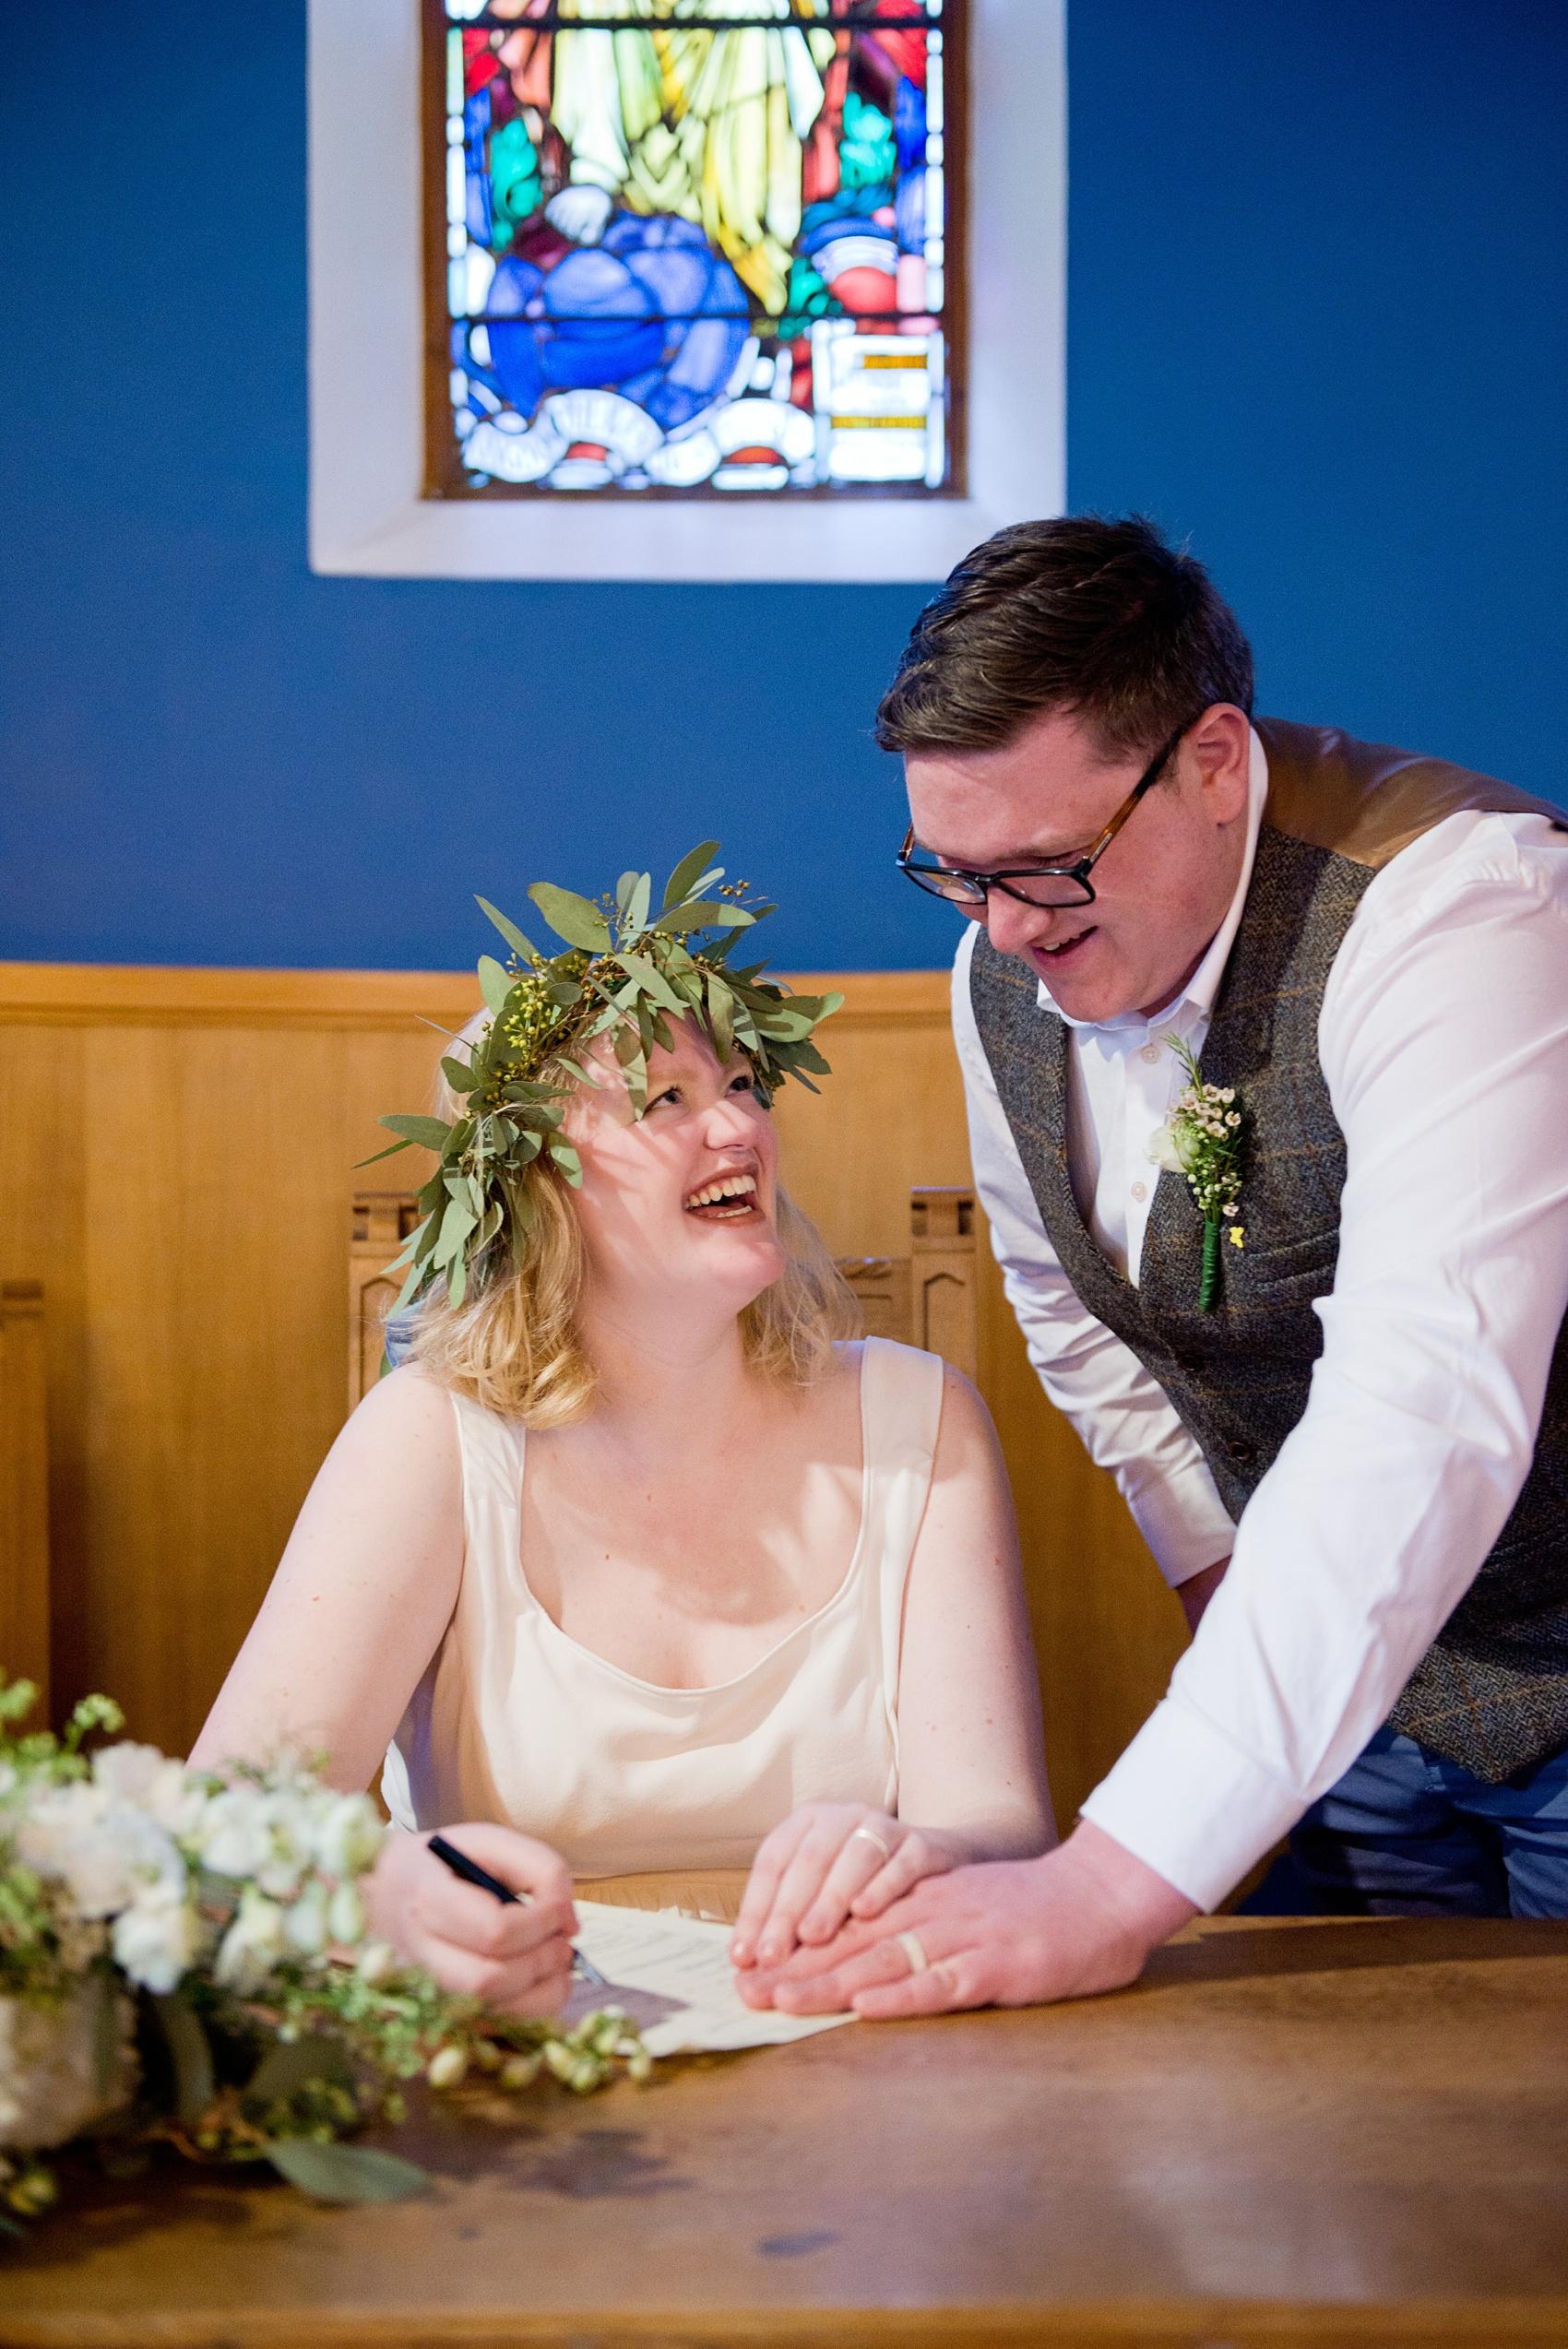 25-Pregnant-bride-her-Scottish-Highlands-wedding.jpg